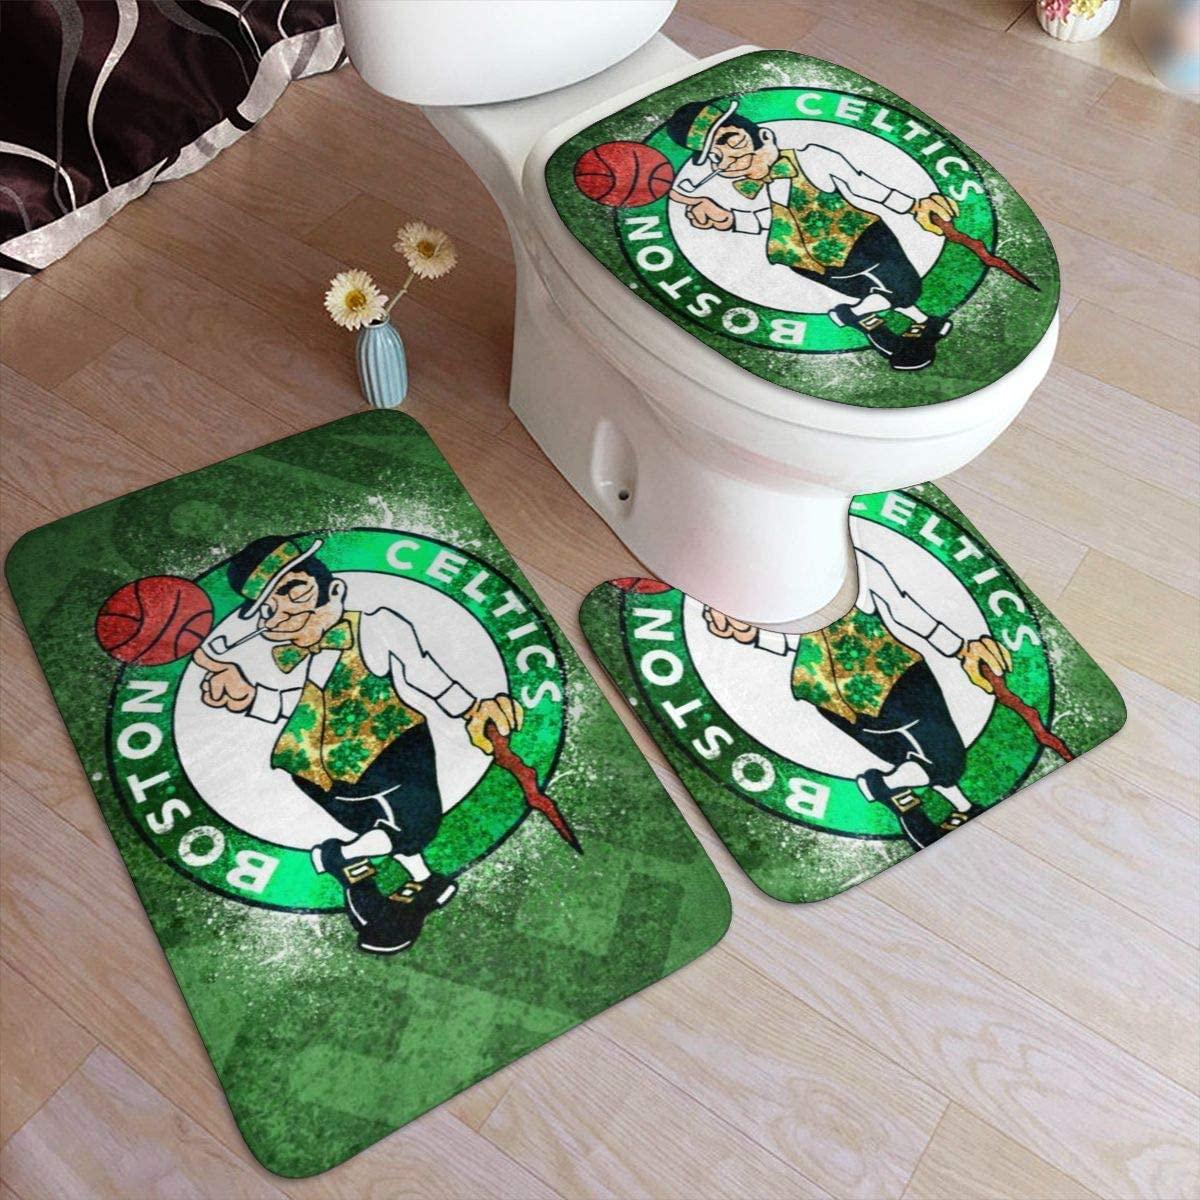 Kanteband Non Slip Bathroom Rug Set Boston 3 Piece Bath Doormat Celtics Anti-Skid Pads Bath Mat + U Shaped Contour Rug + Toilet Lid Cover